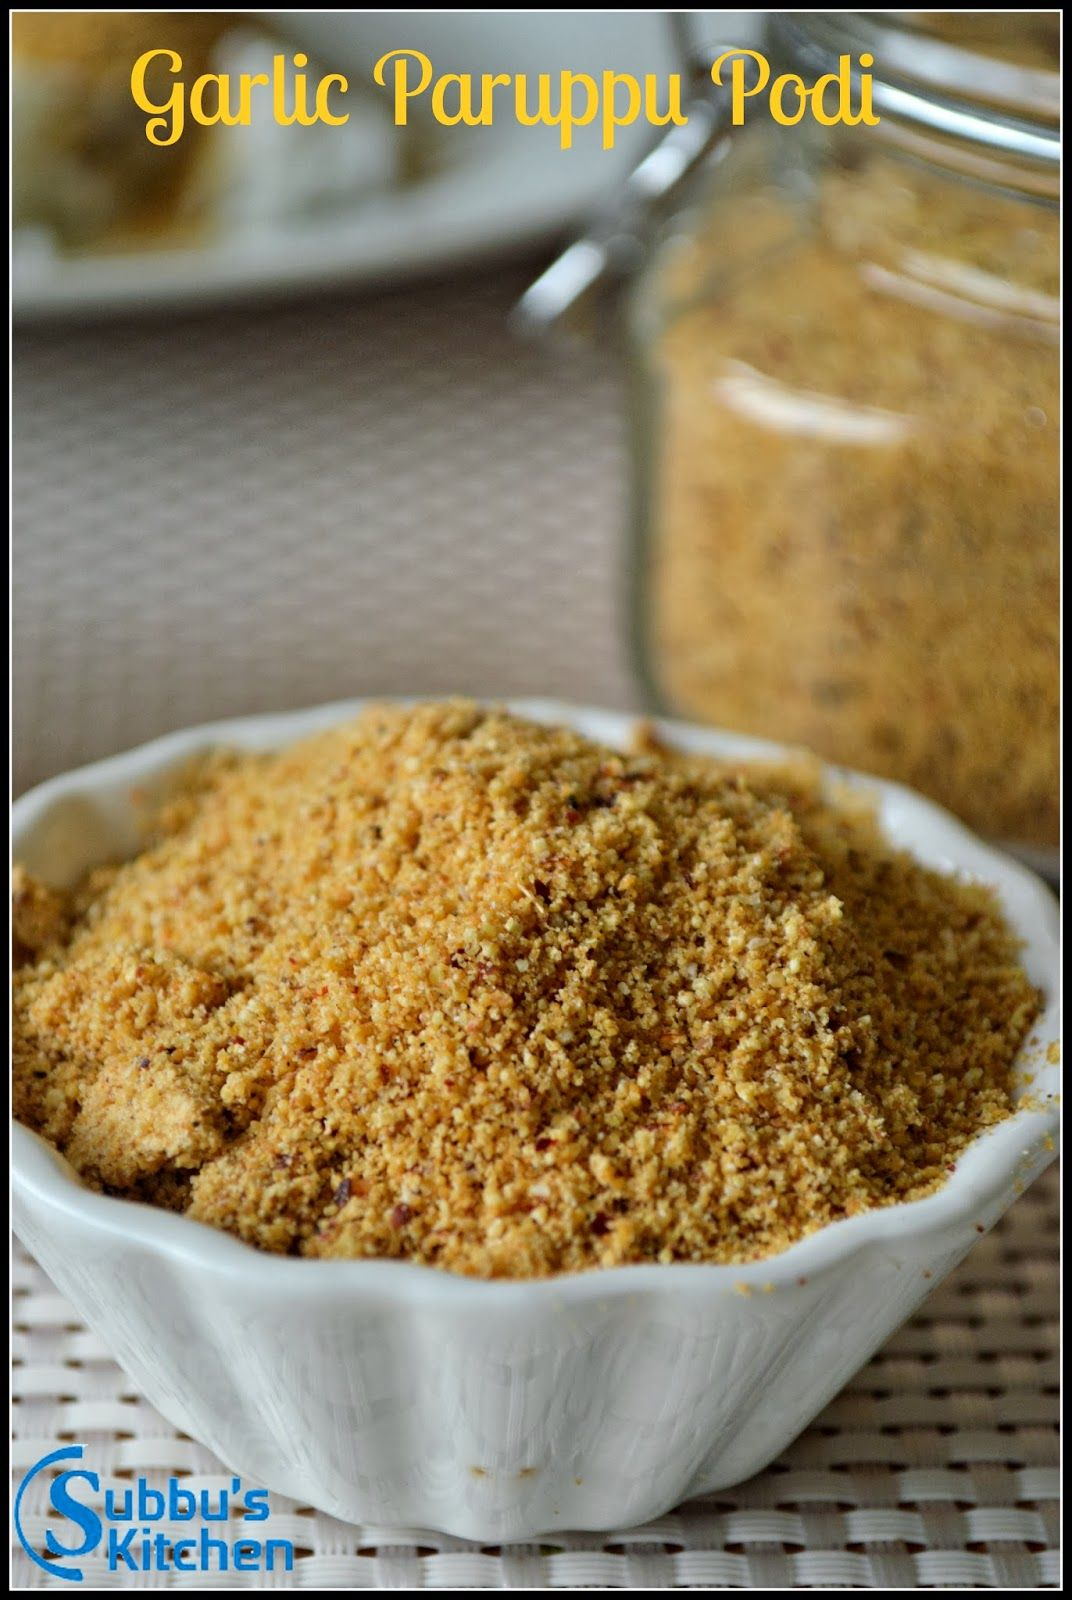 Garlic Paruppu Podi Subbus Kitchen Podi Recipe Snack Recipes Seasoning Recipes